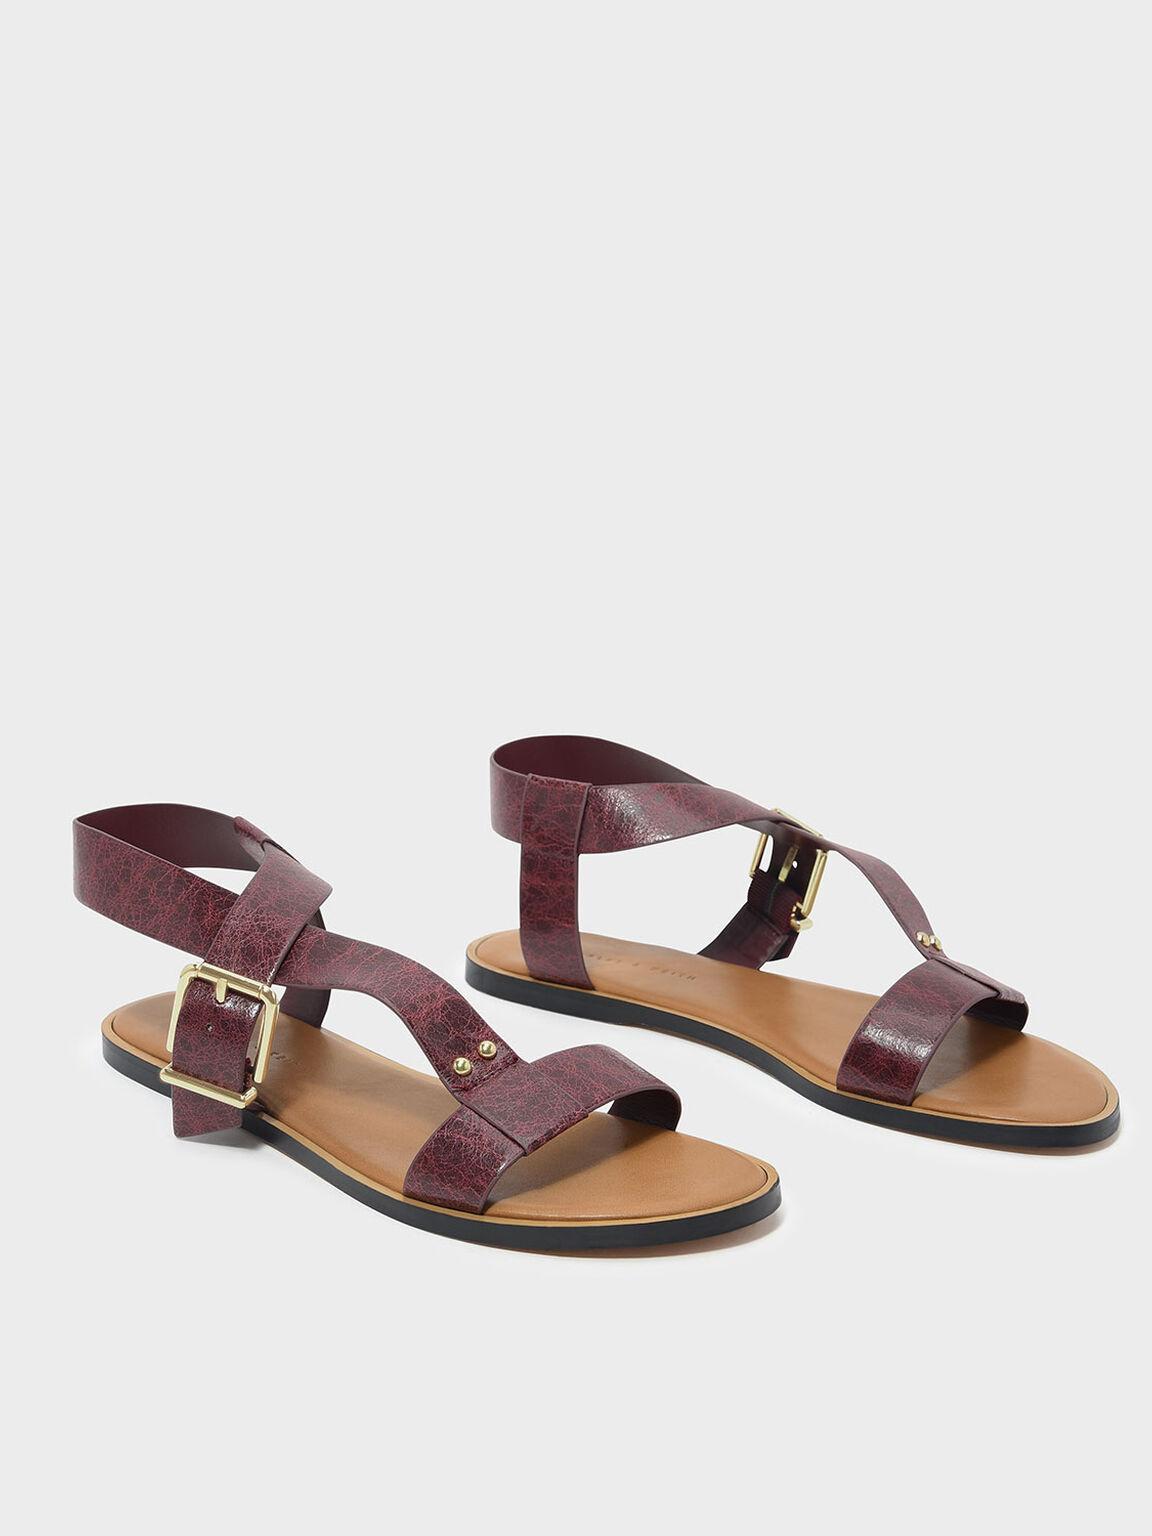 Thick Strap Sandals, Burgundy, hi-res